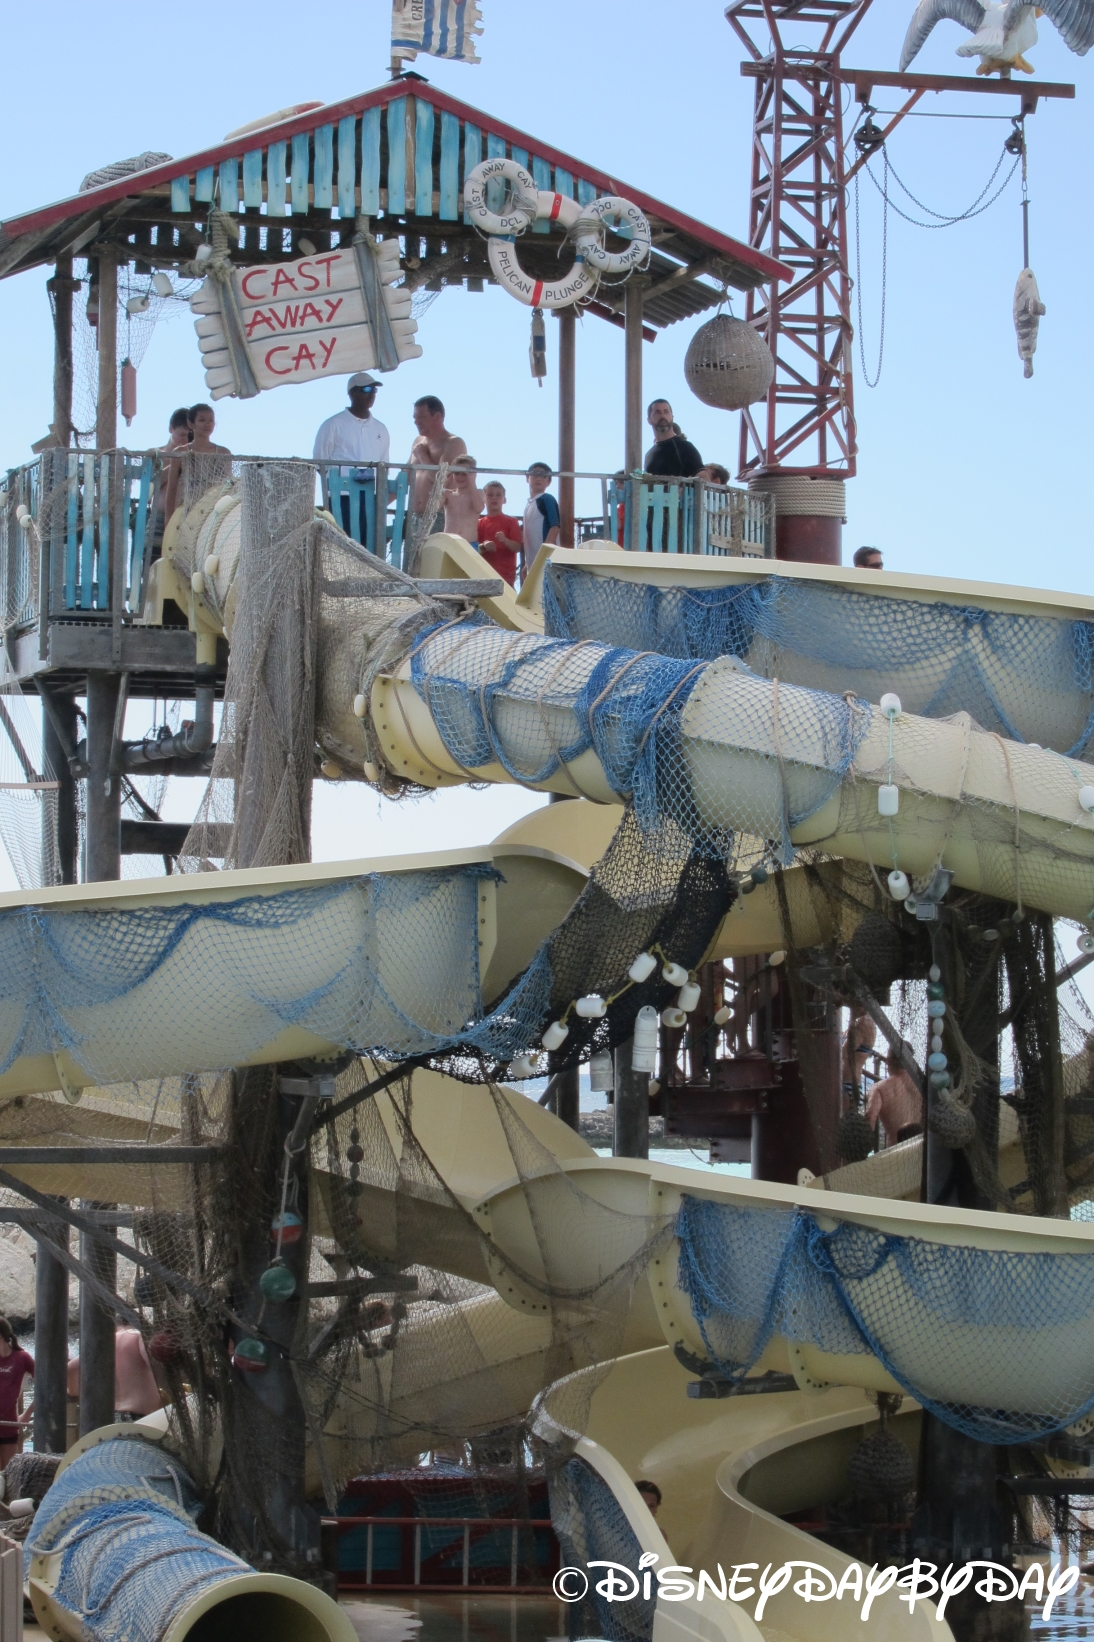 Hidden Mickey Monday: Pelican Plunge at Castaway Cay